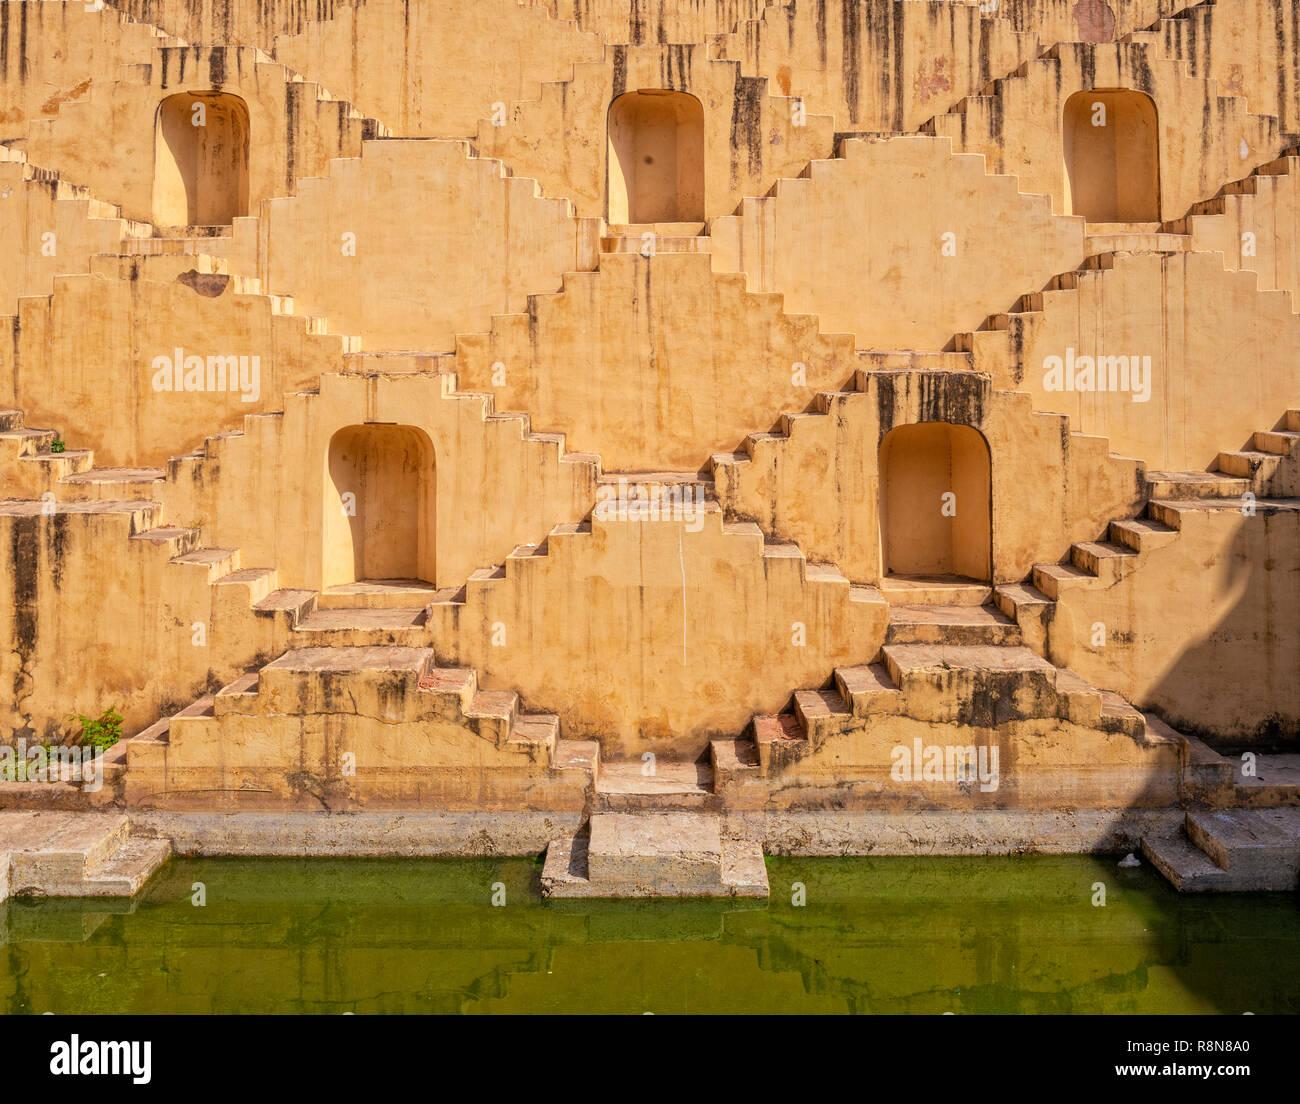 Chand Baori stepwell in Jaipur, India Stock Photo